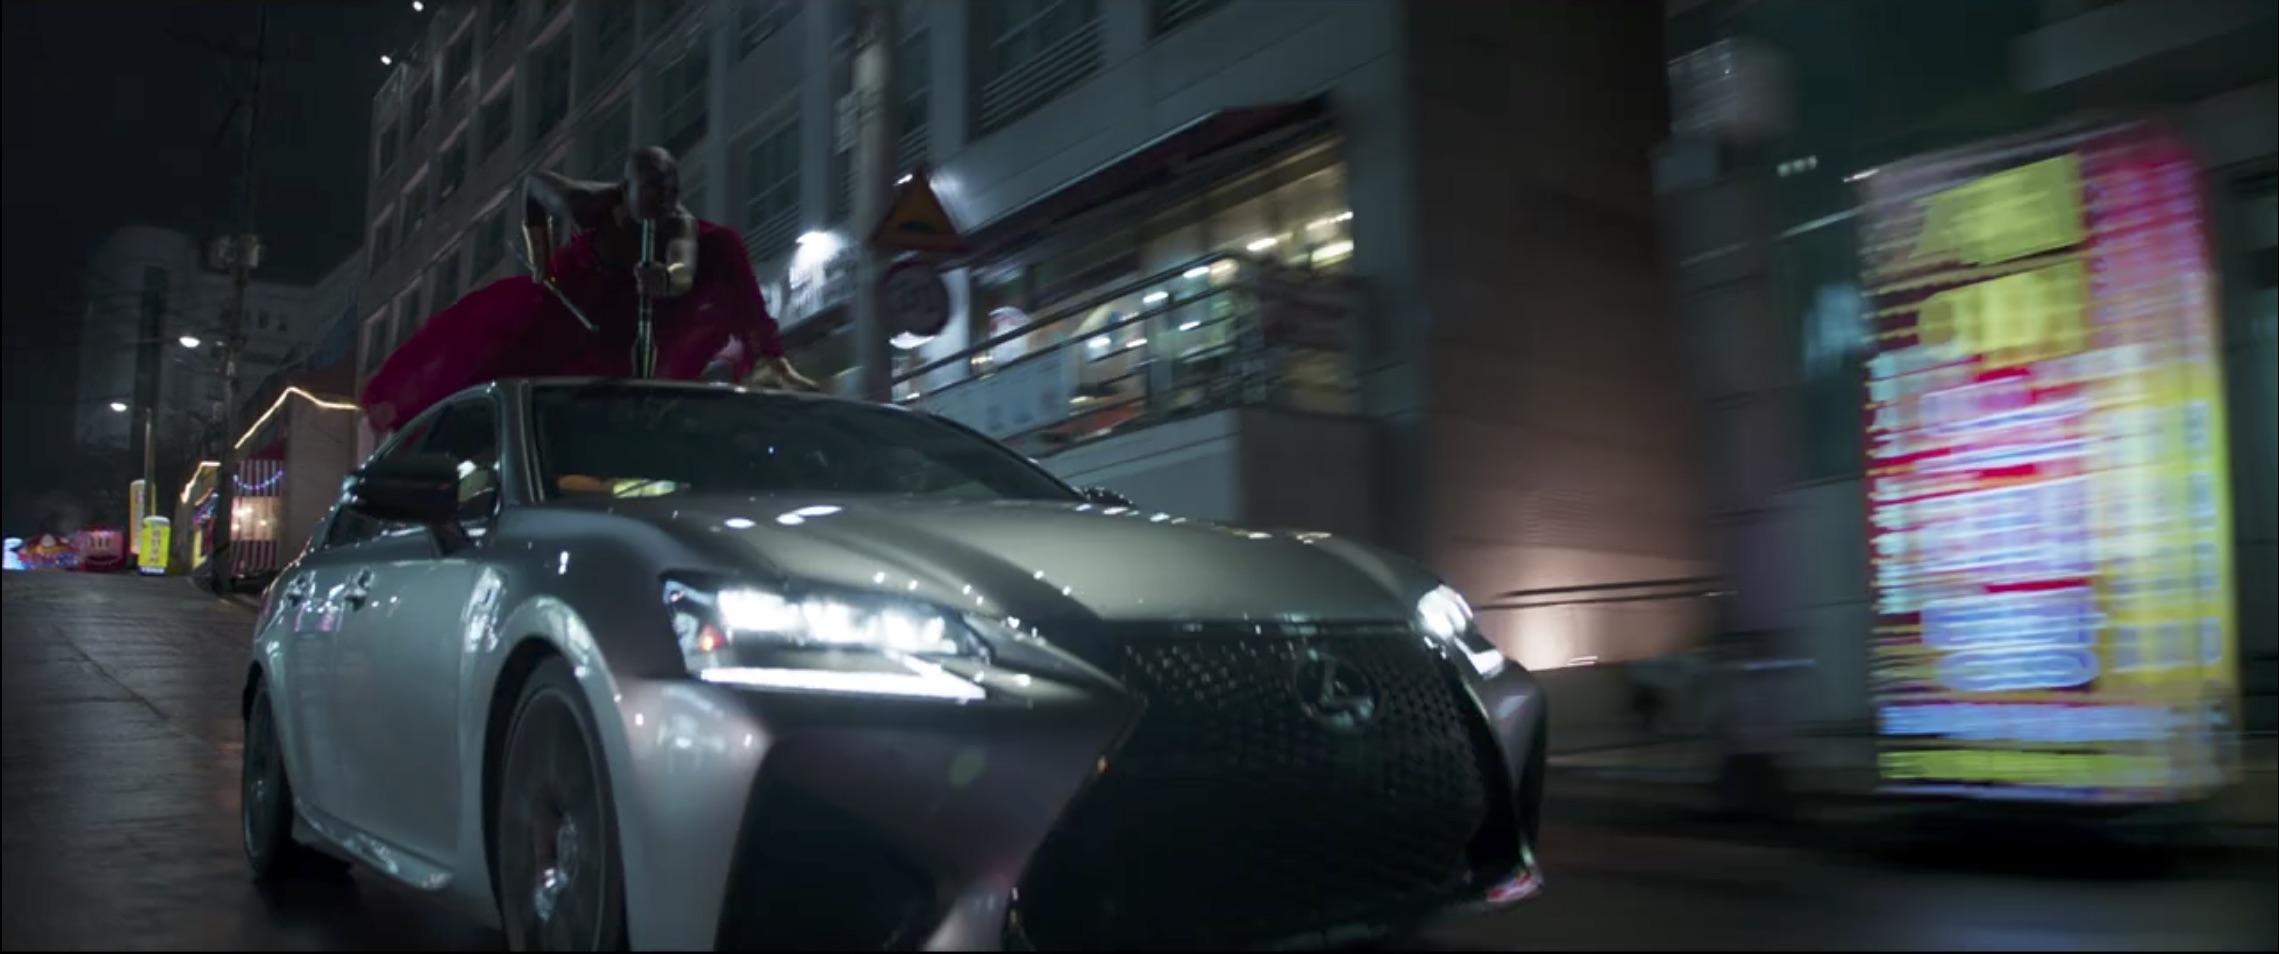 Marvel Black Panther lexus car chase sword on car